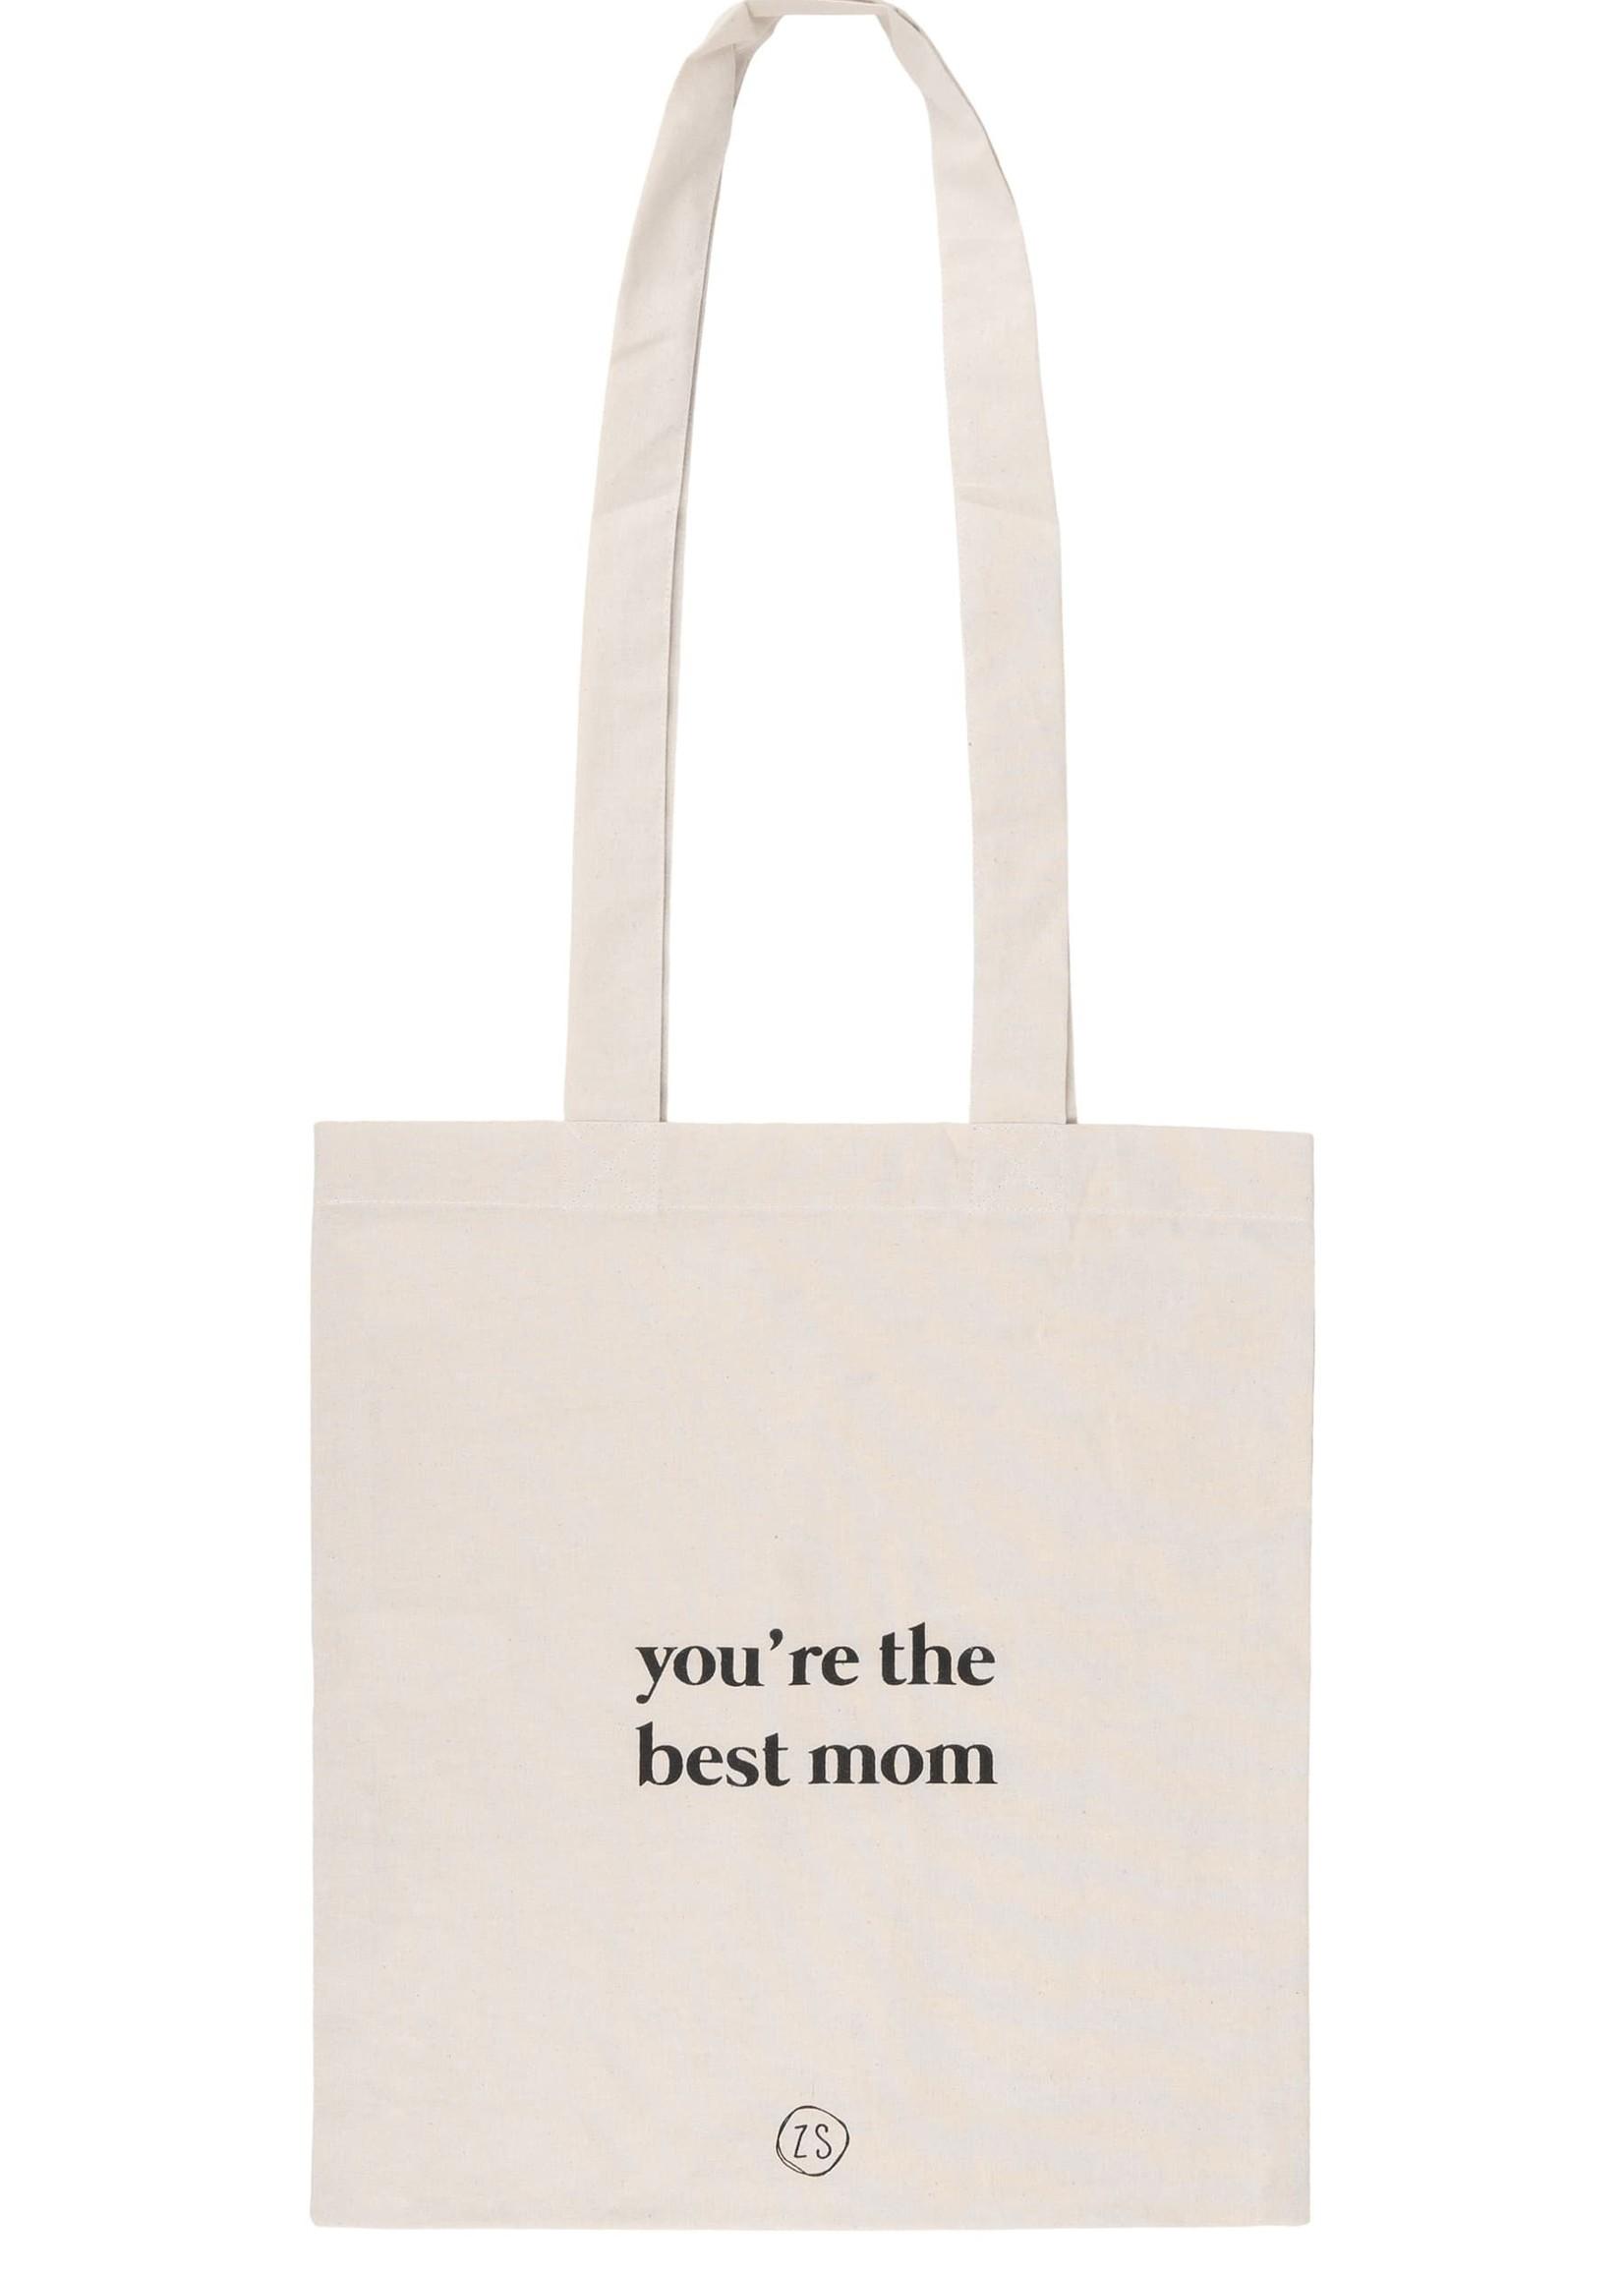 ZUSSS kantoenen tasje best mom naturel